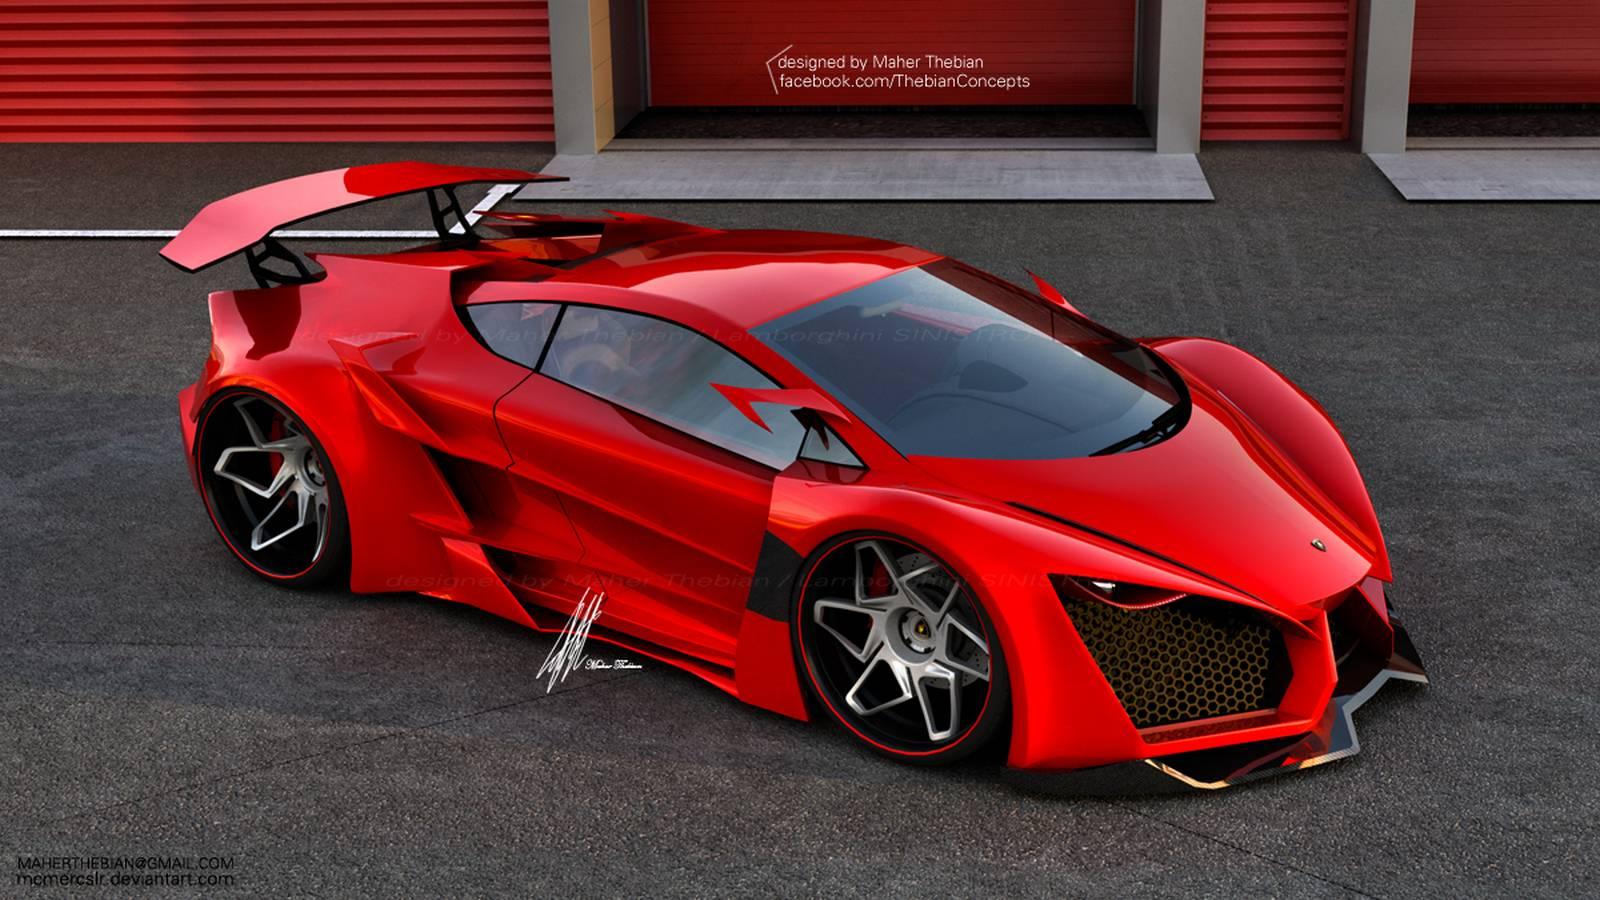 Ferrari 2016 Pret >> Render: Lamborghini Sinistro by Maher Thebian - GTspirit